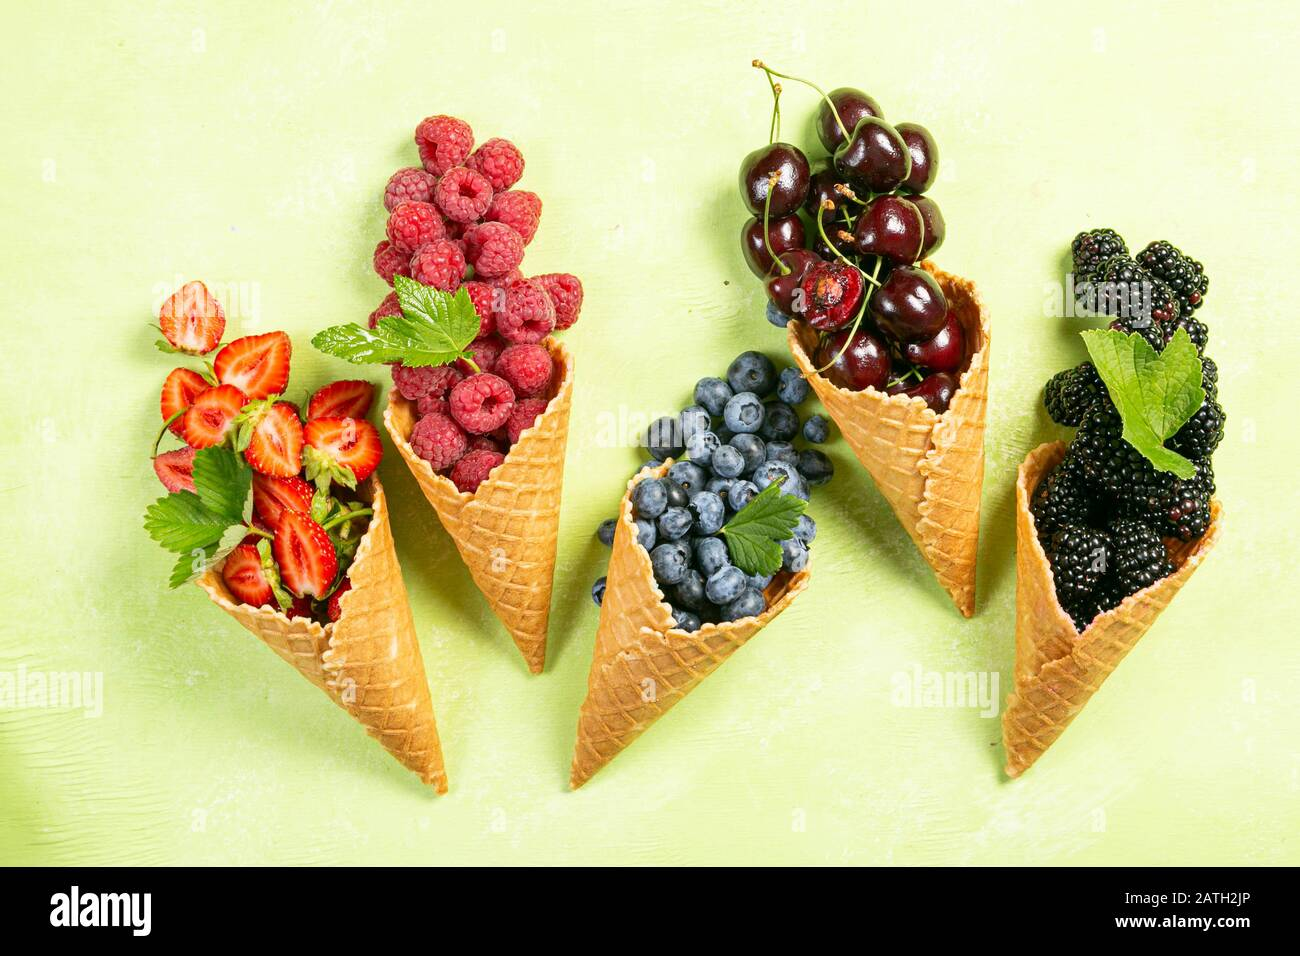 Selection of berries in ice cream cones Stock Photo